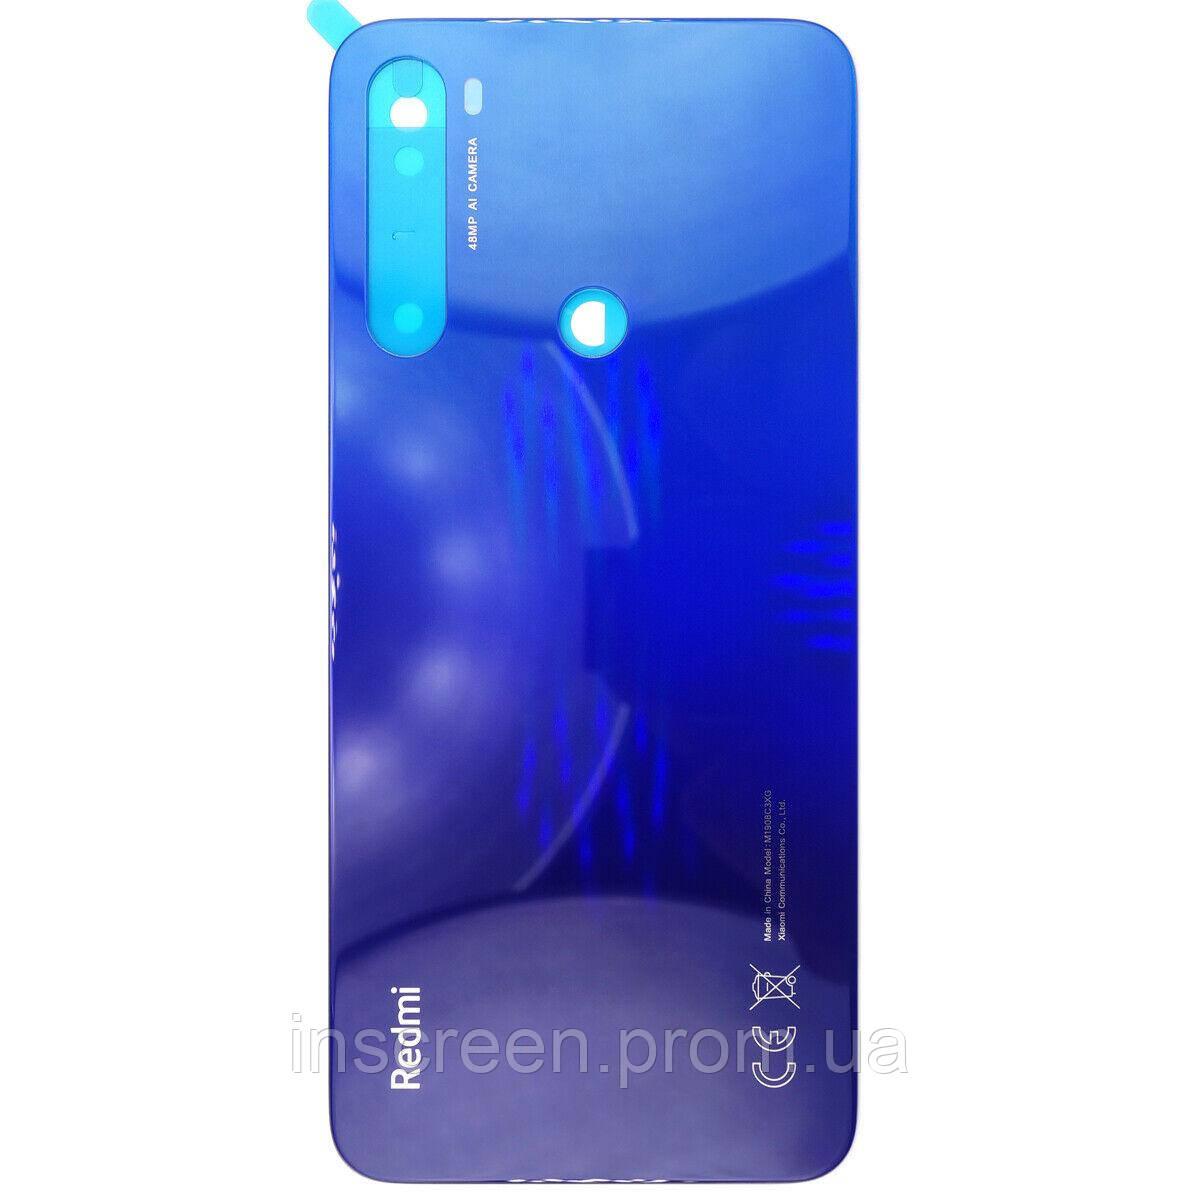 Задня кришка Xiaomi Redmi Note 8T синя Оригінал Китай